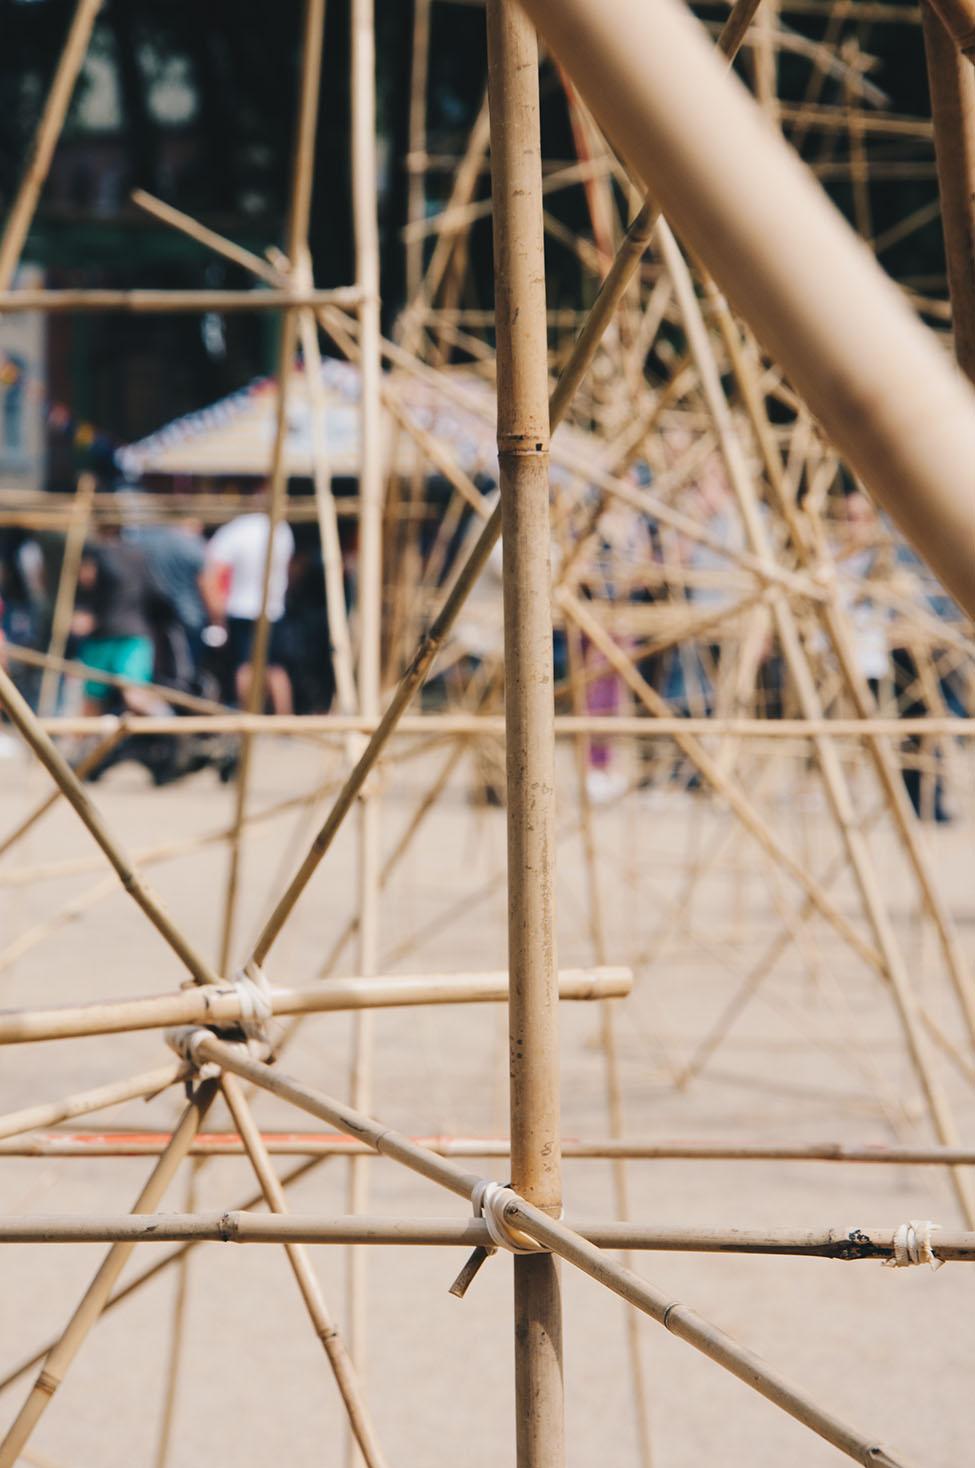 festival métamorphoses, week-end à liège